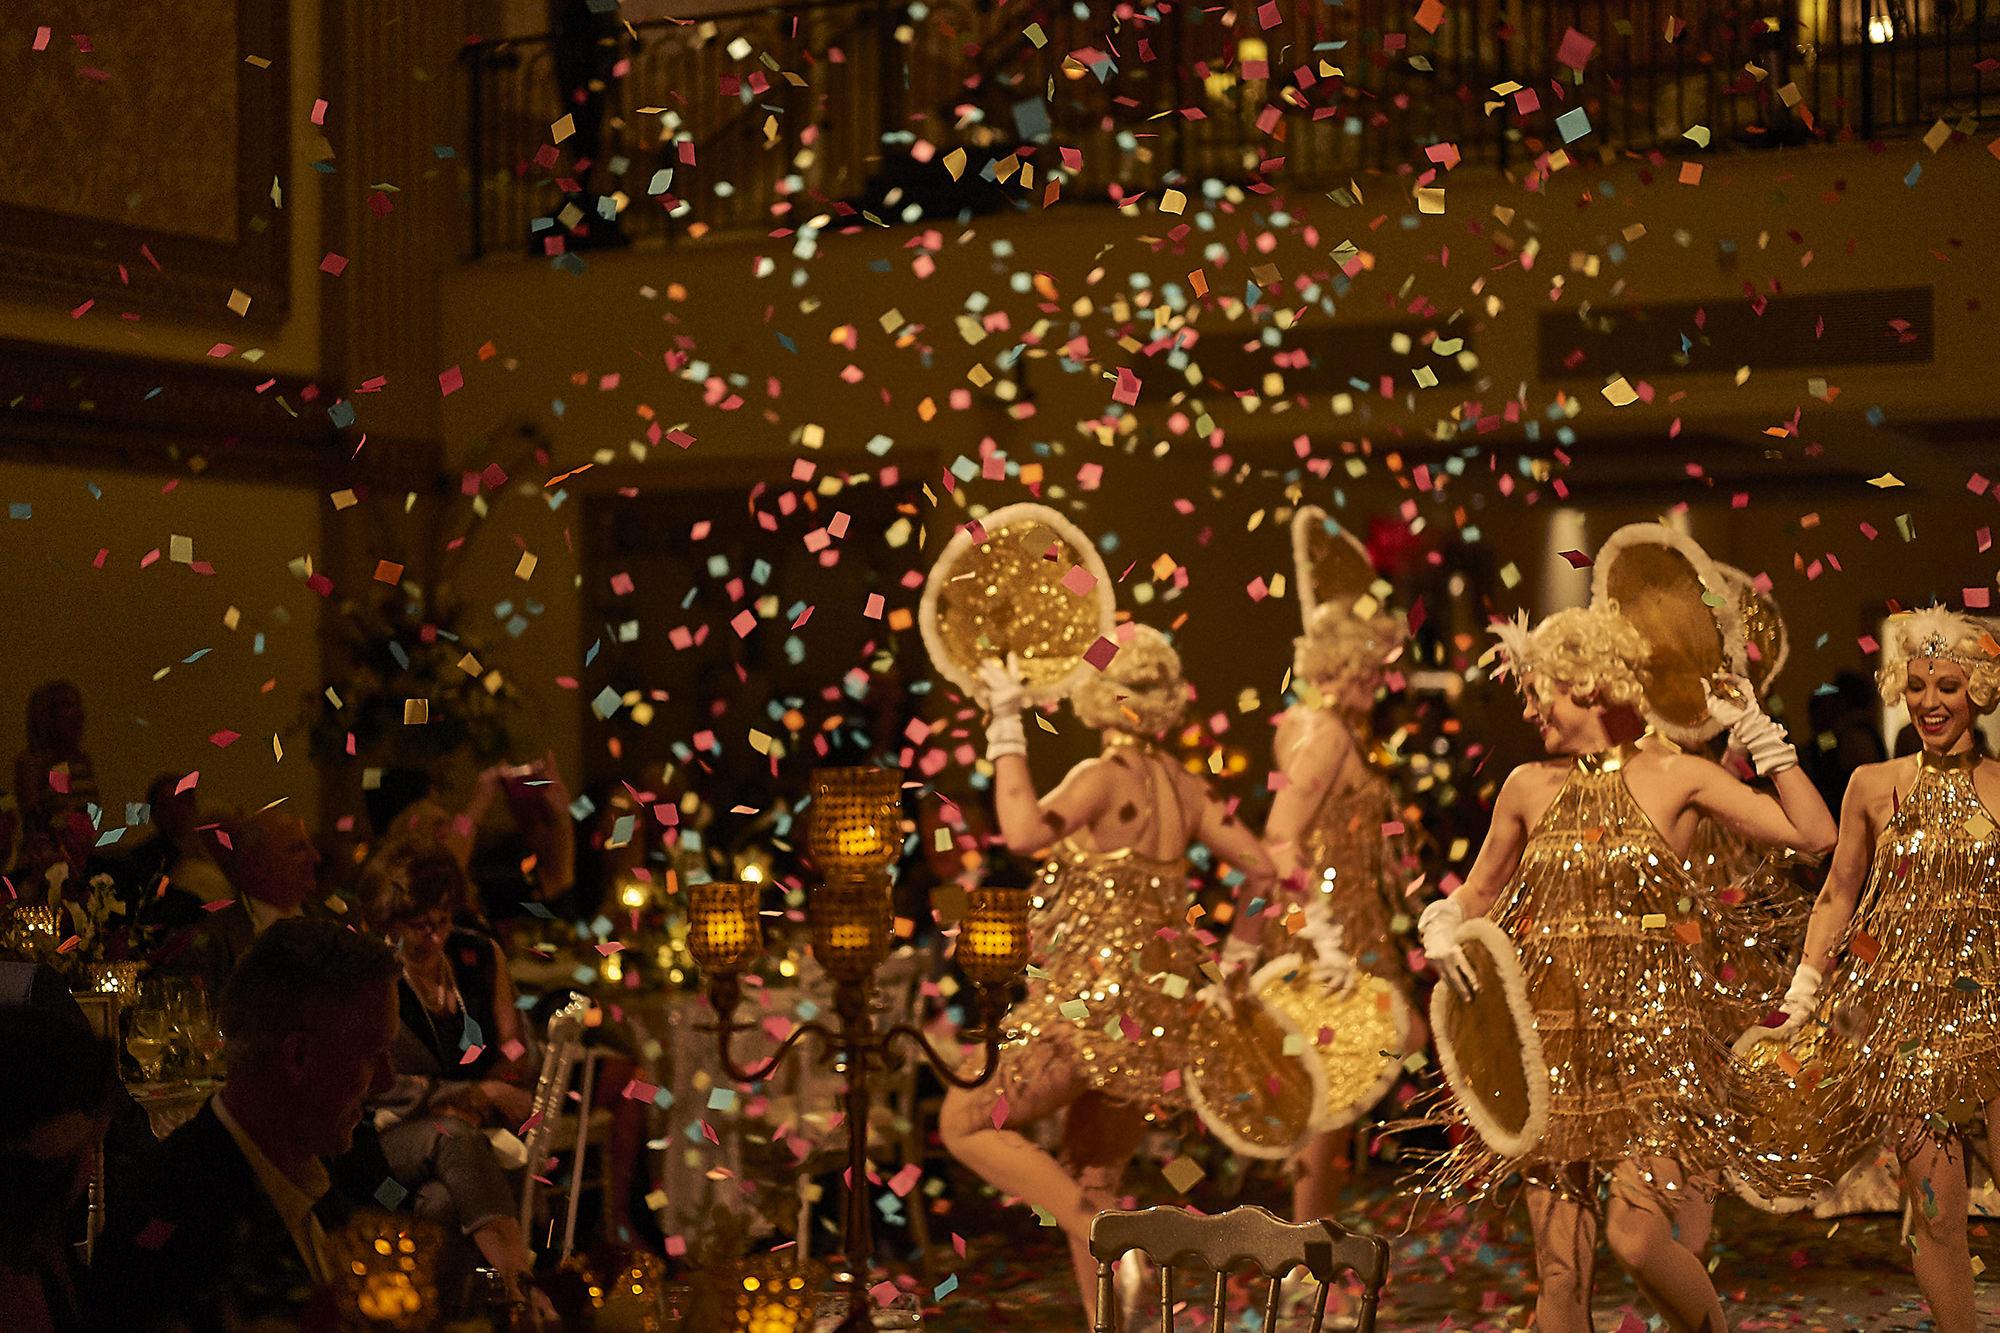 The Honey Taps Dancing In Confetti